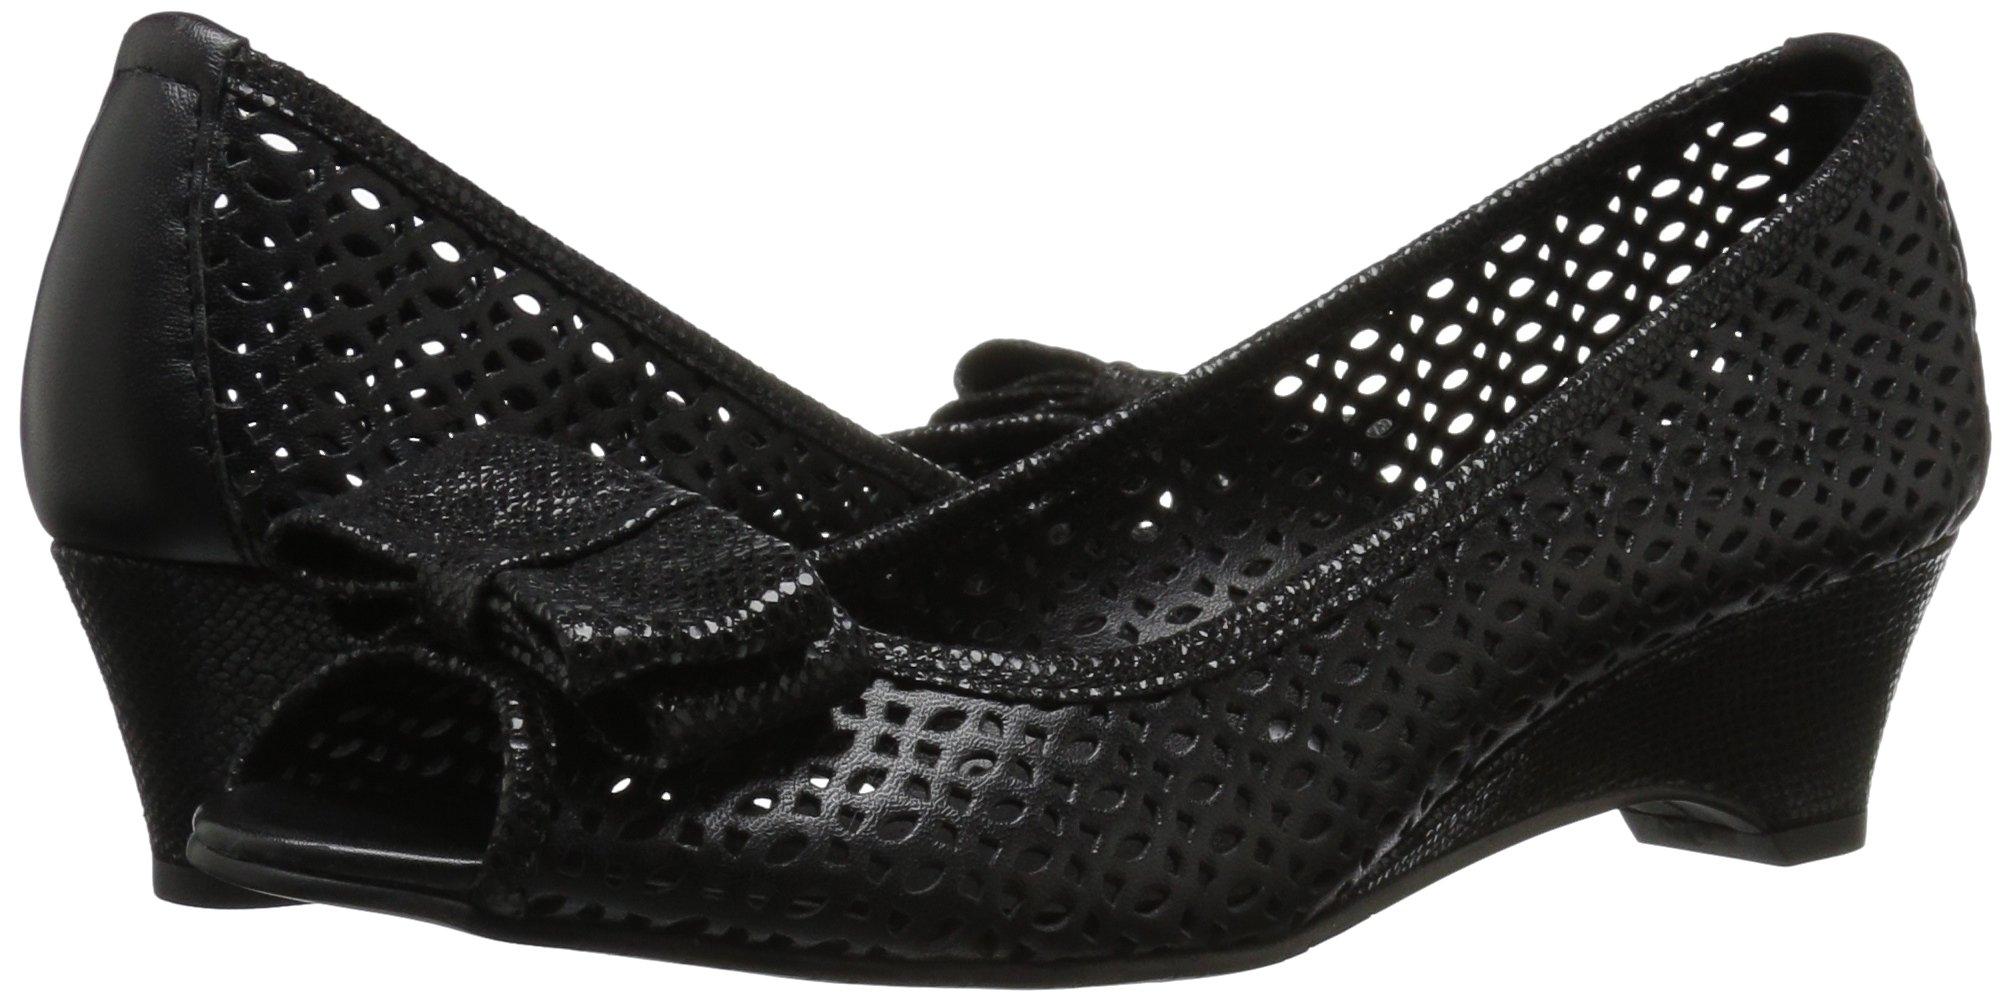 VANELi Women's Brinly Wedge Sandal, Black Perfed Nappa/Black Summer VIP, 9.5 N US by VANELi (Image #6)